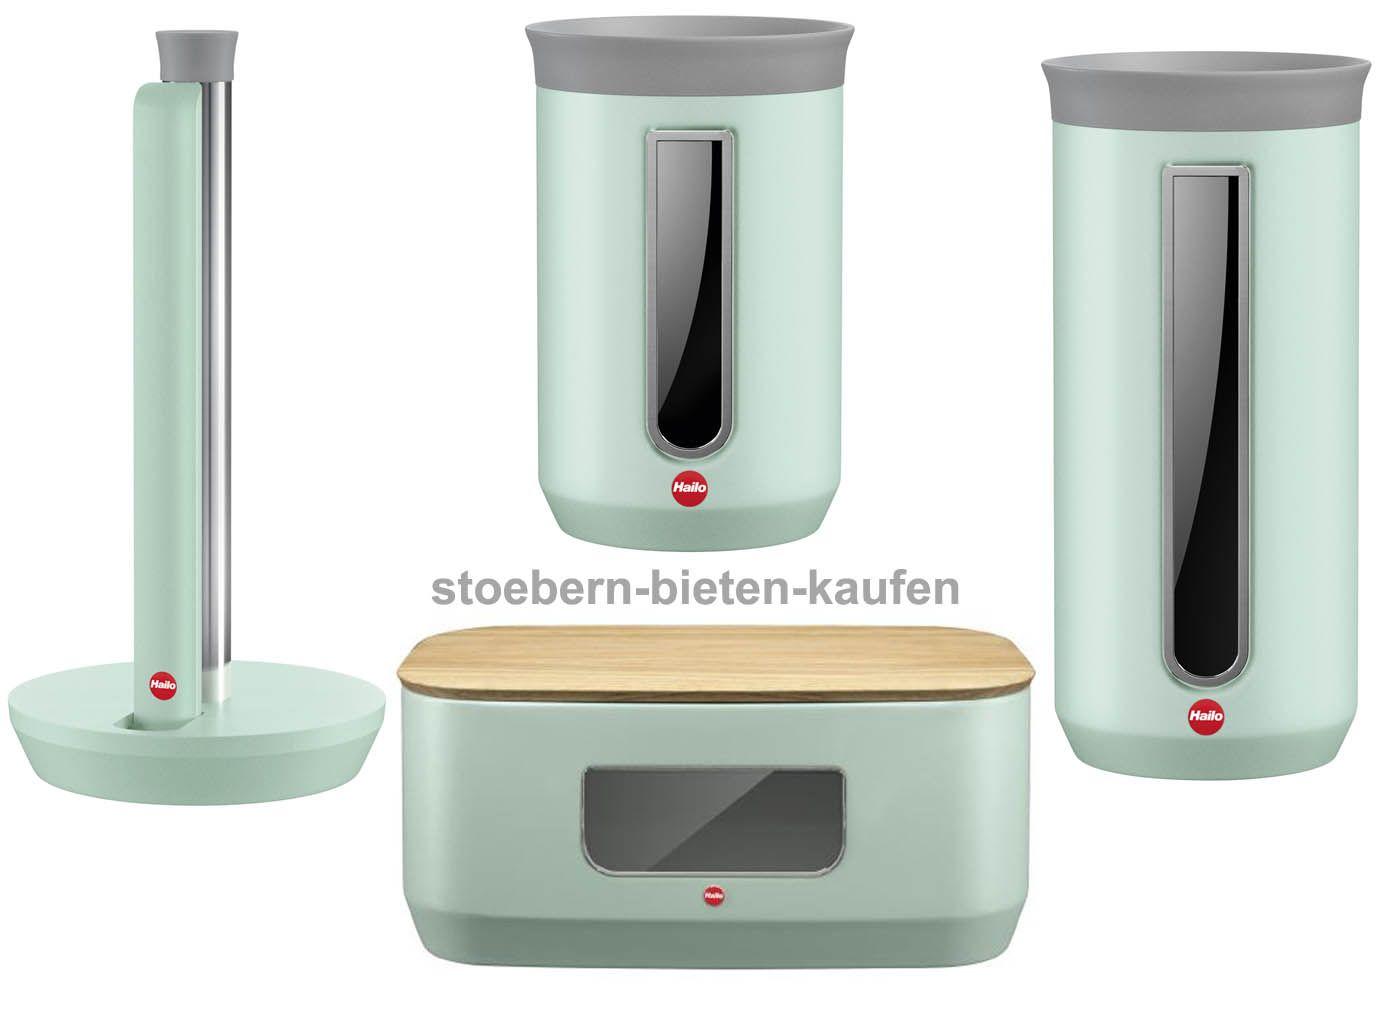 hailo kitchenline design k chenrollenhalter brotkasten eckig 2 vorratsdosen mint matt. Black Bedroom Furniture Sets. Home Design Ideas